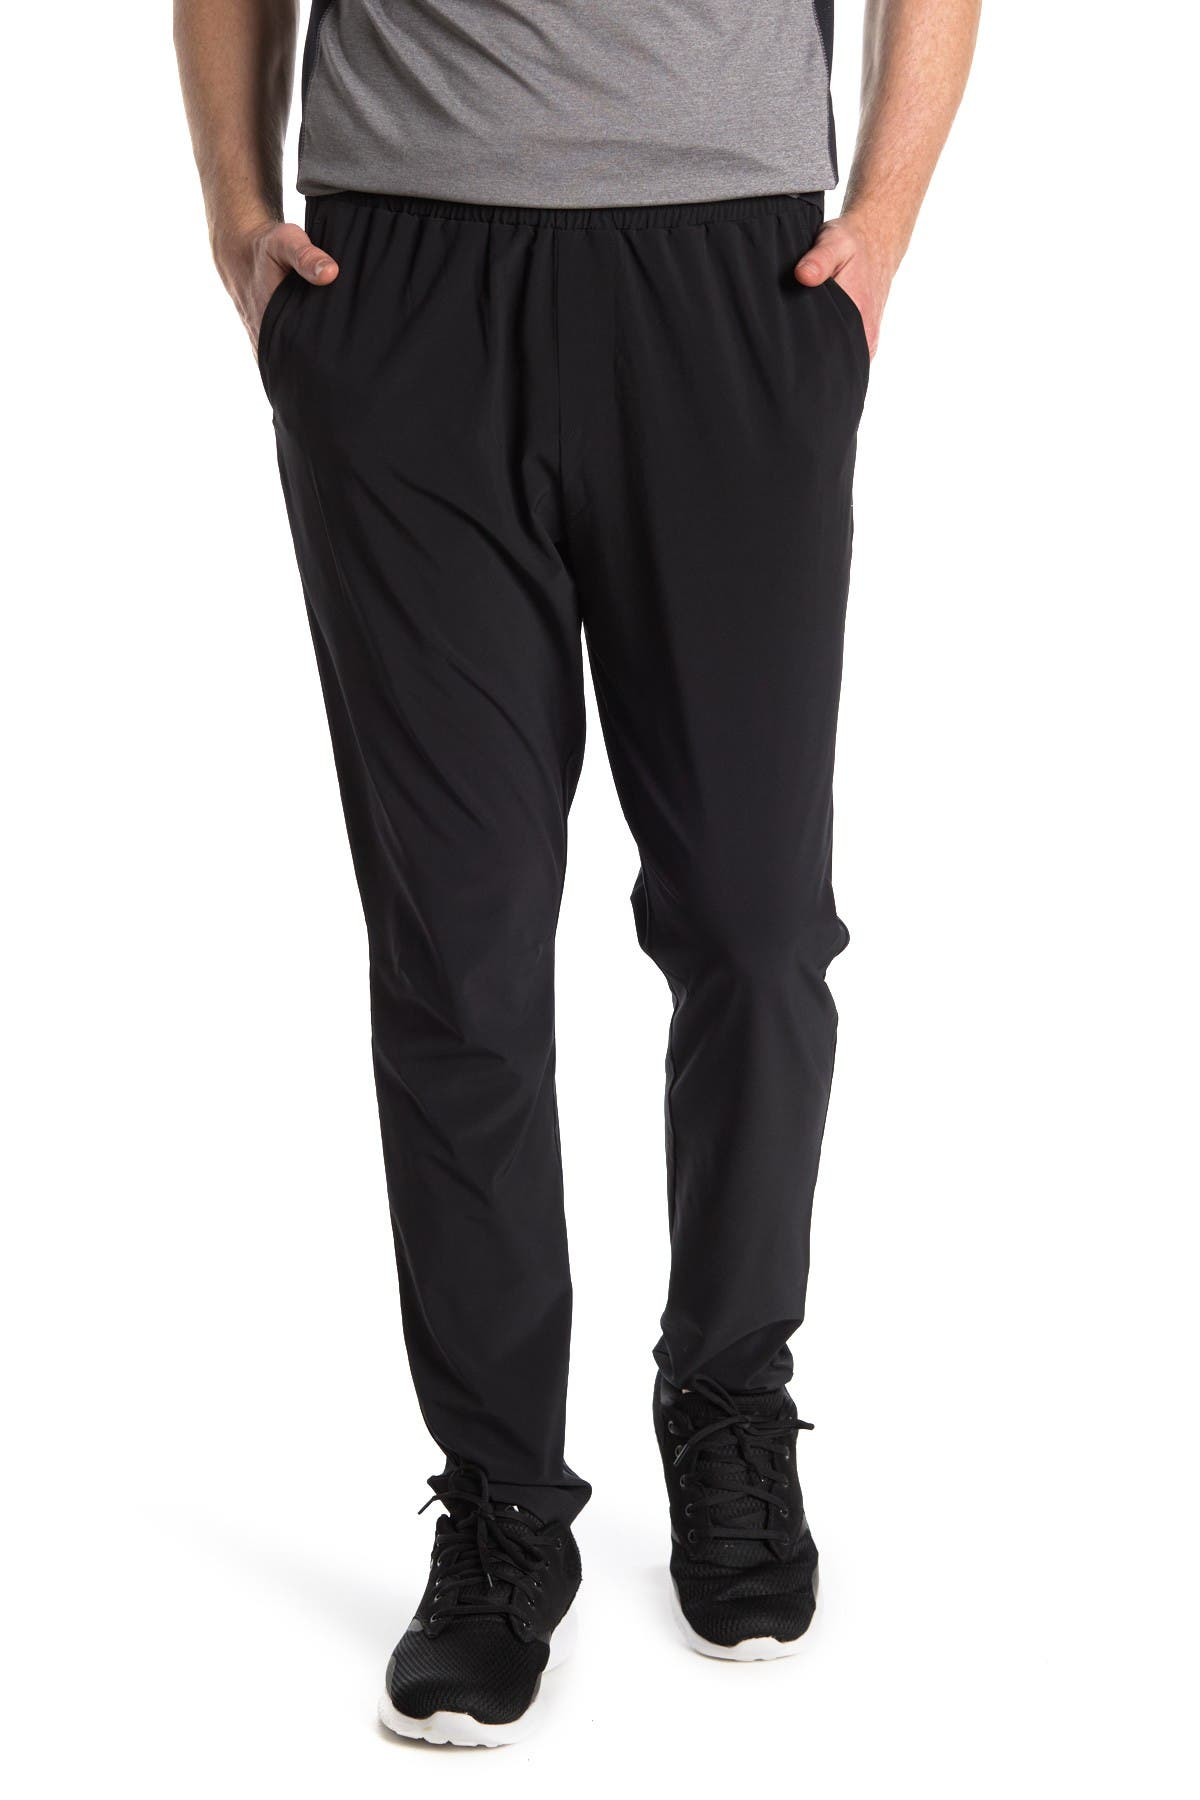 Image of Z By Zella Traverse Woven Pants